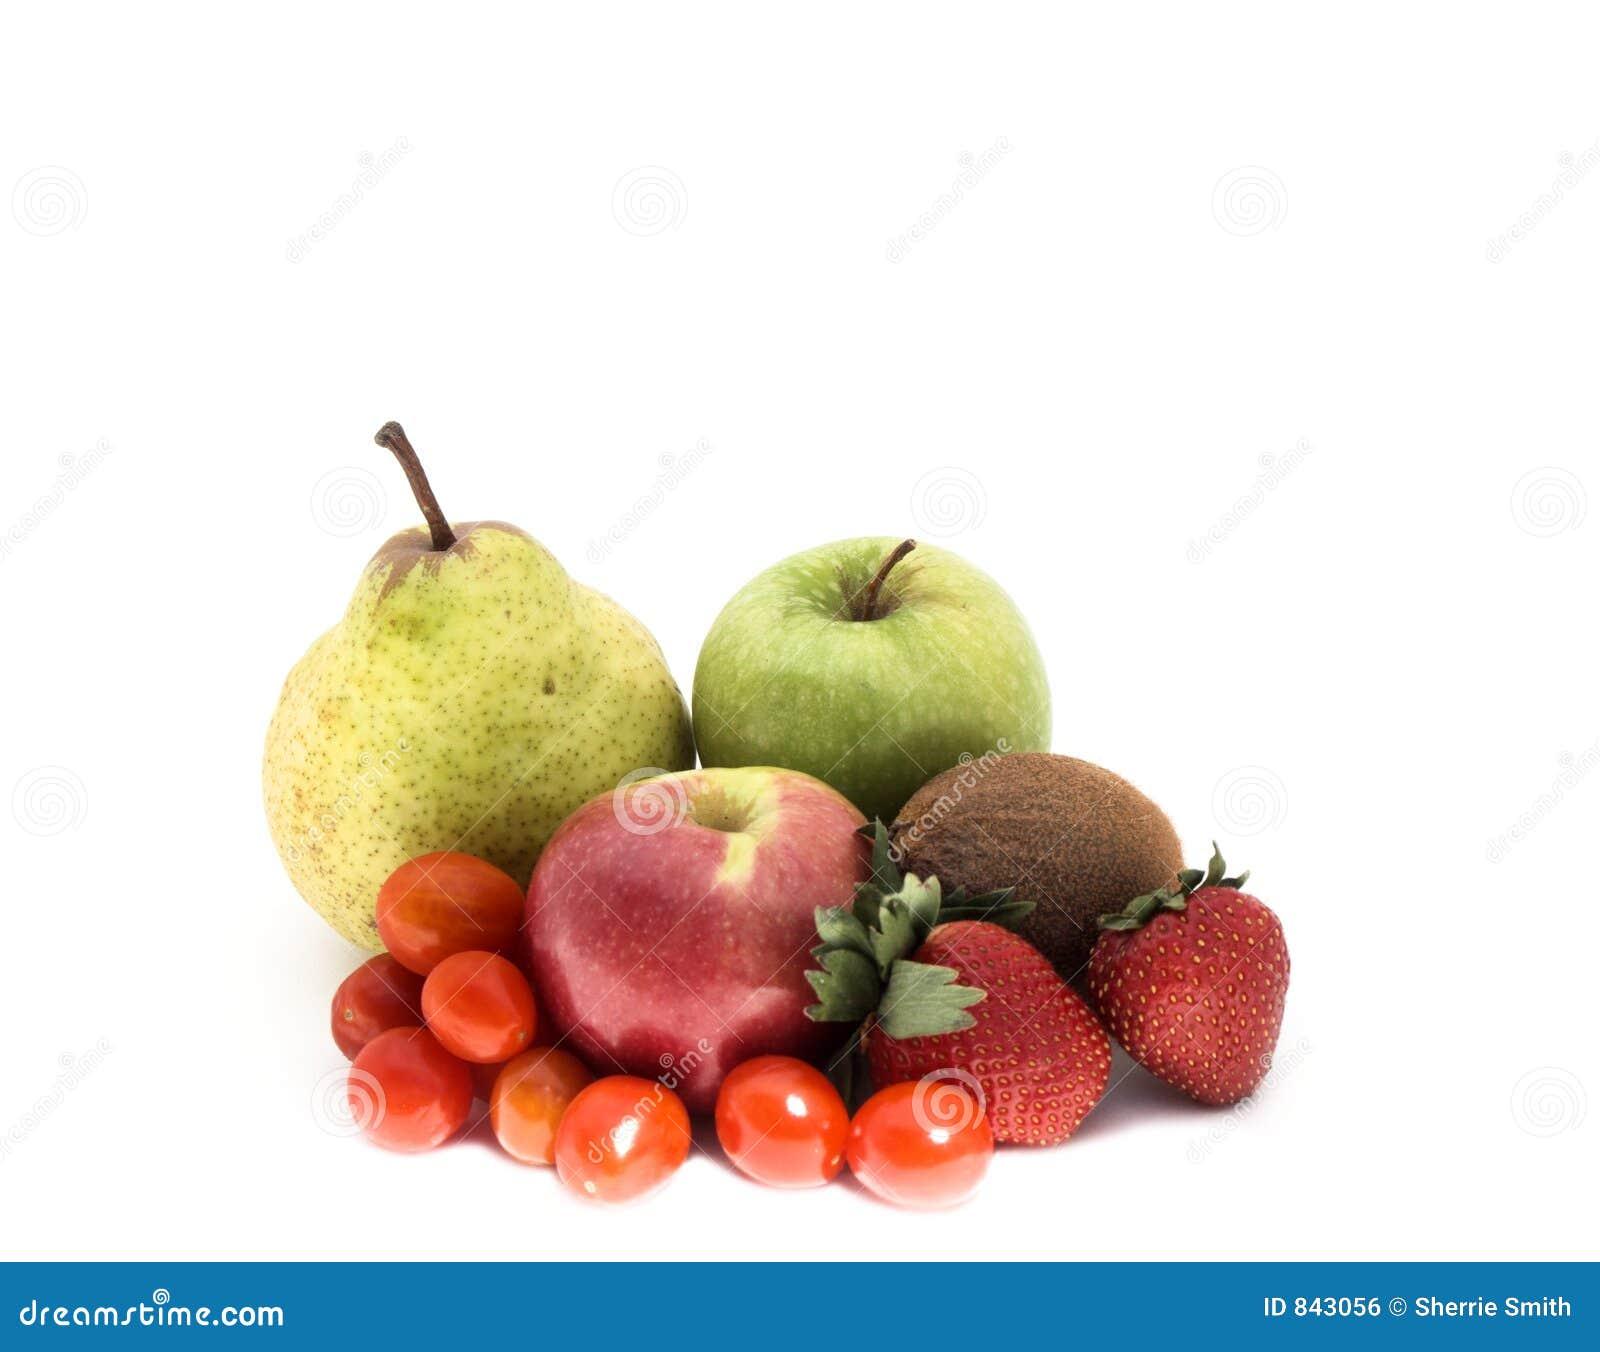 Isolated fruit and veg